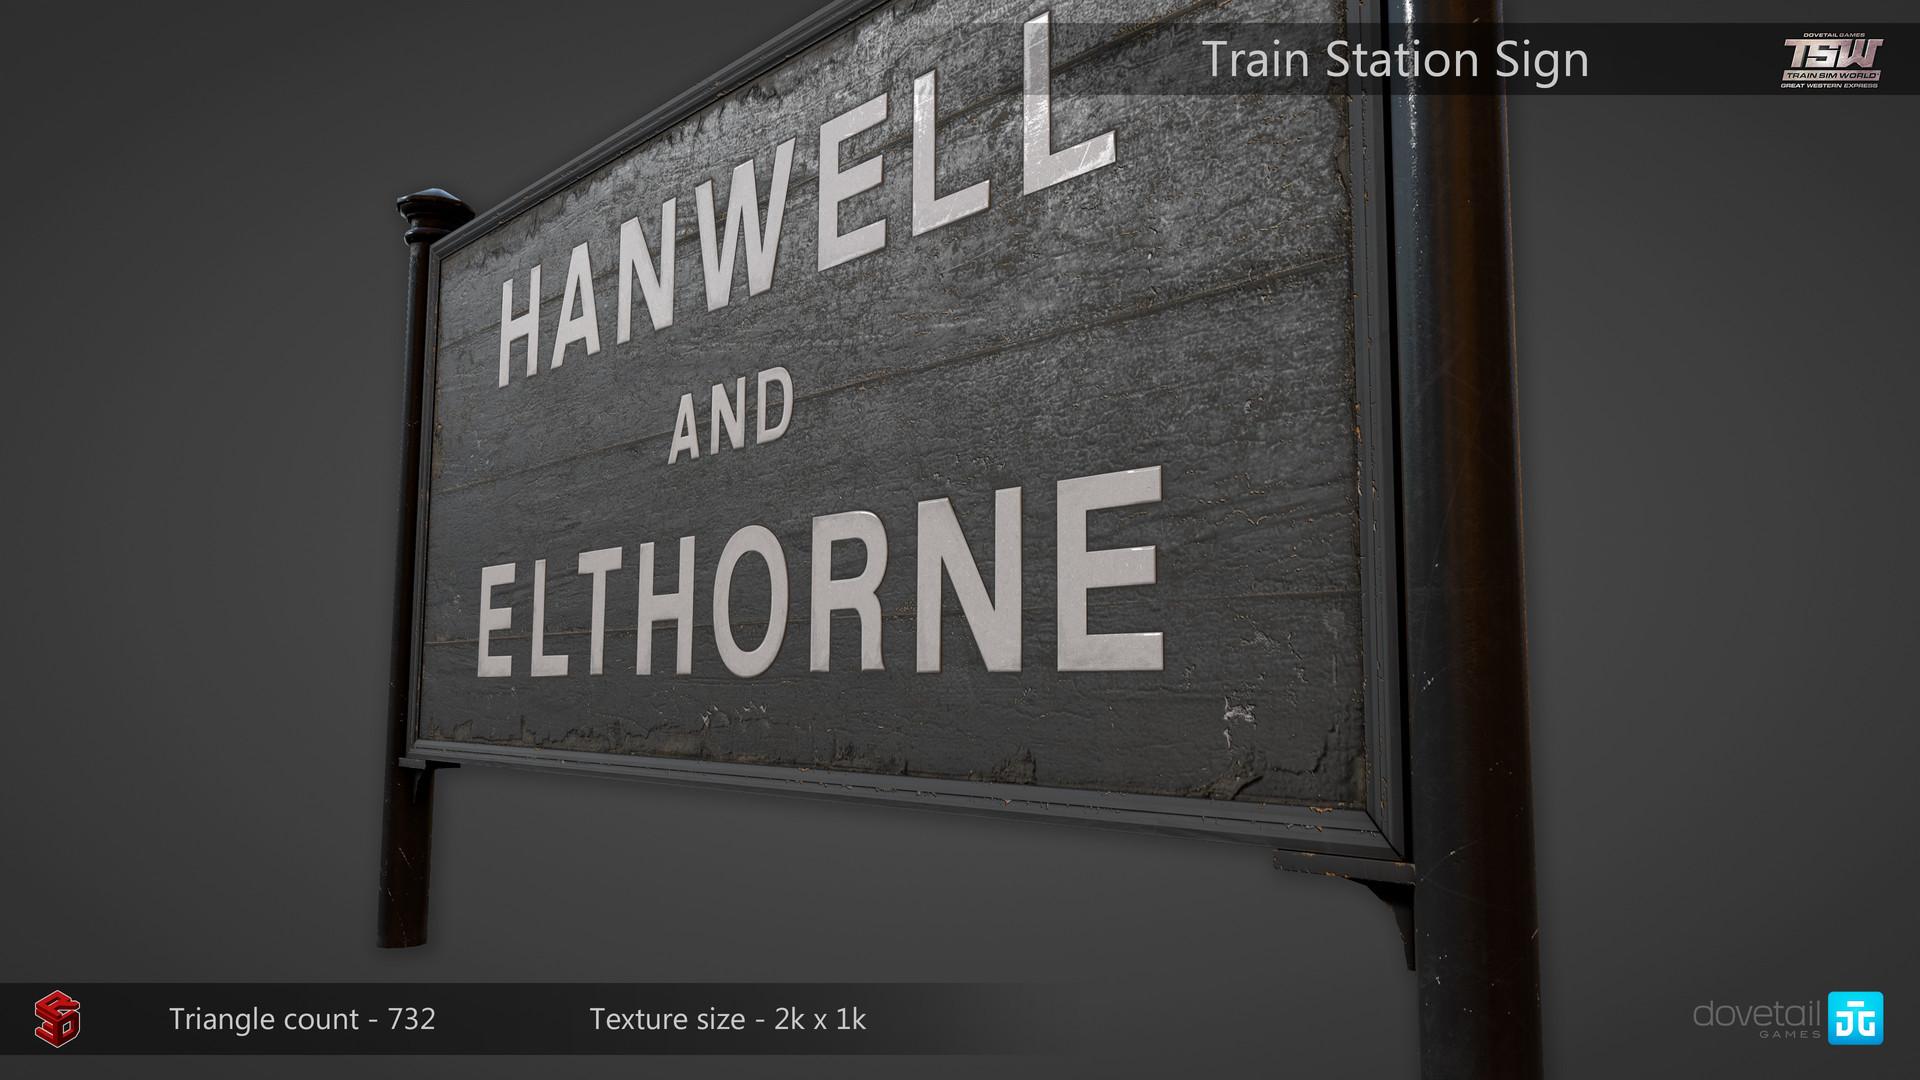 Ross mccafferty trainstationsign 05